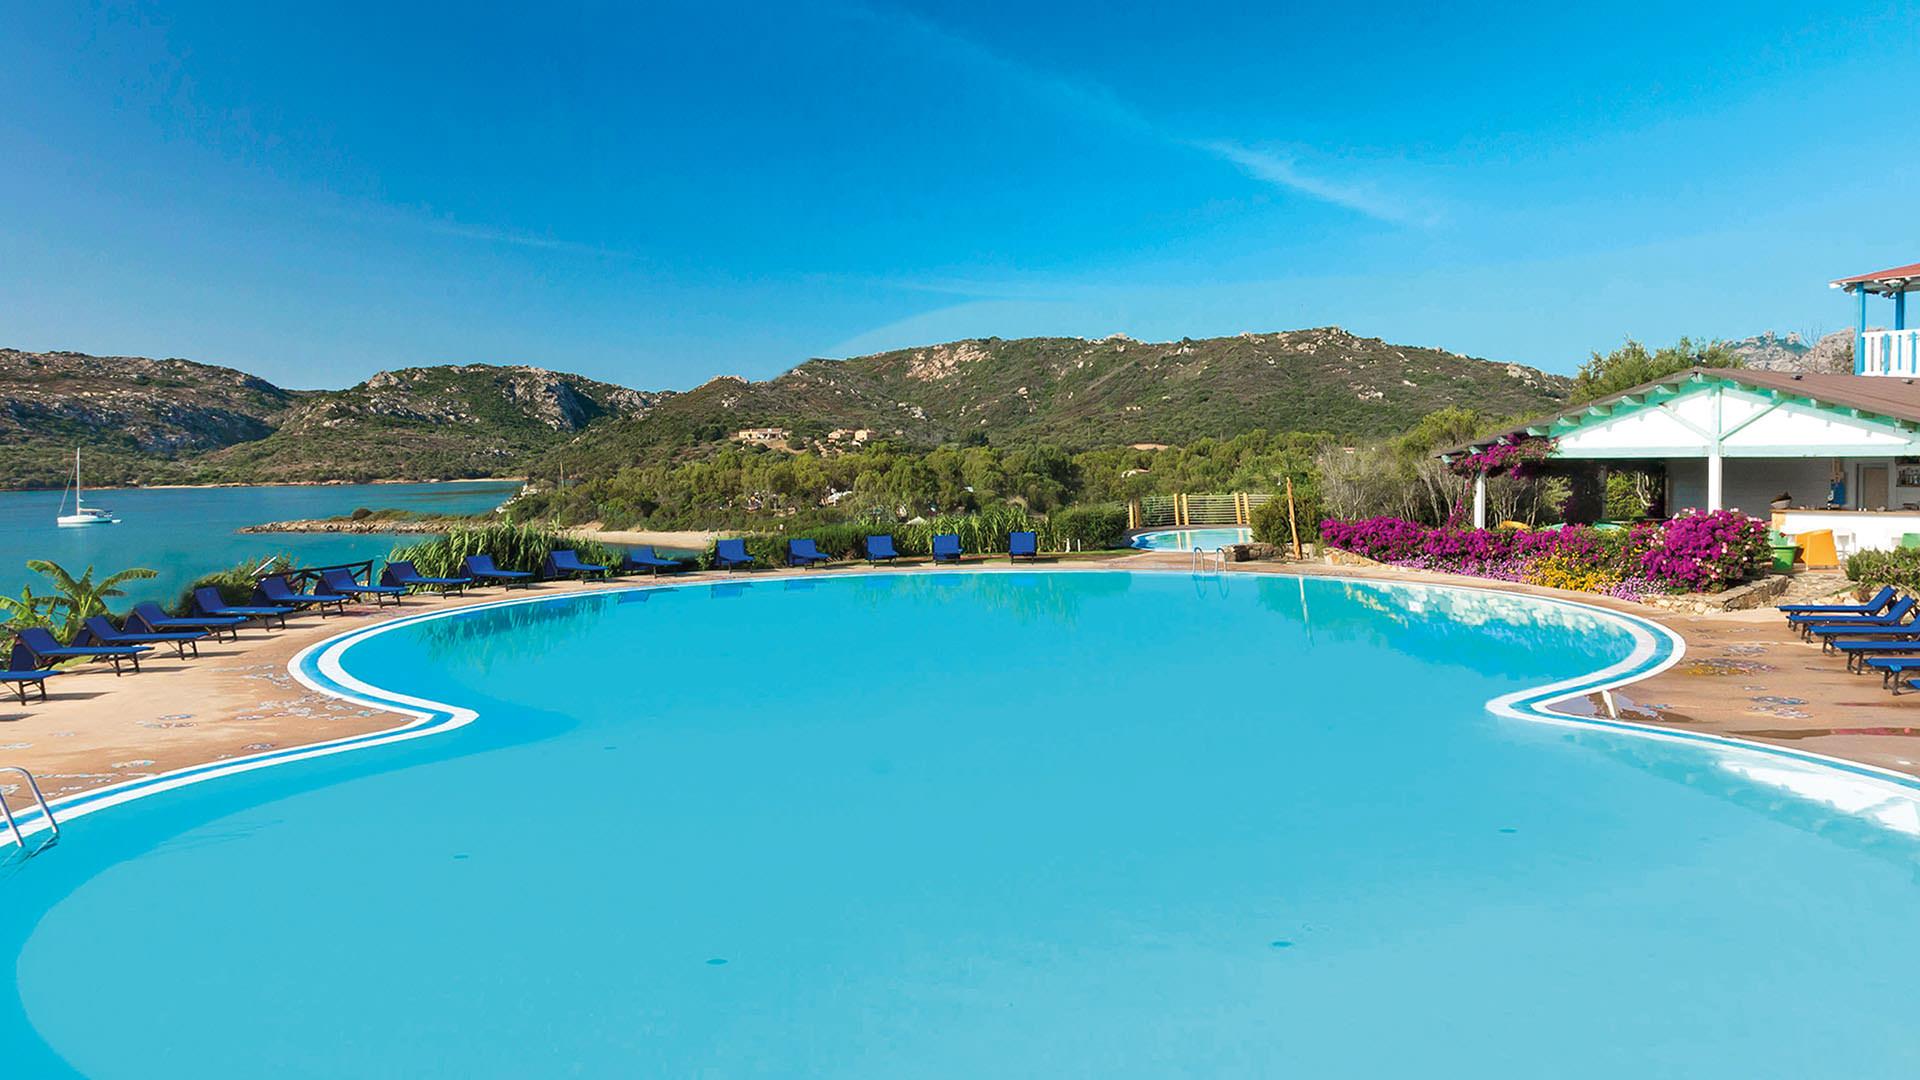 Park hotel cala di lepre in north sardinia 4 stars hotel for Hotel palau sardegna